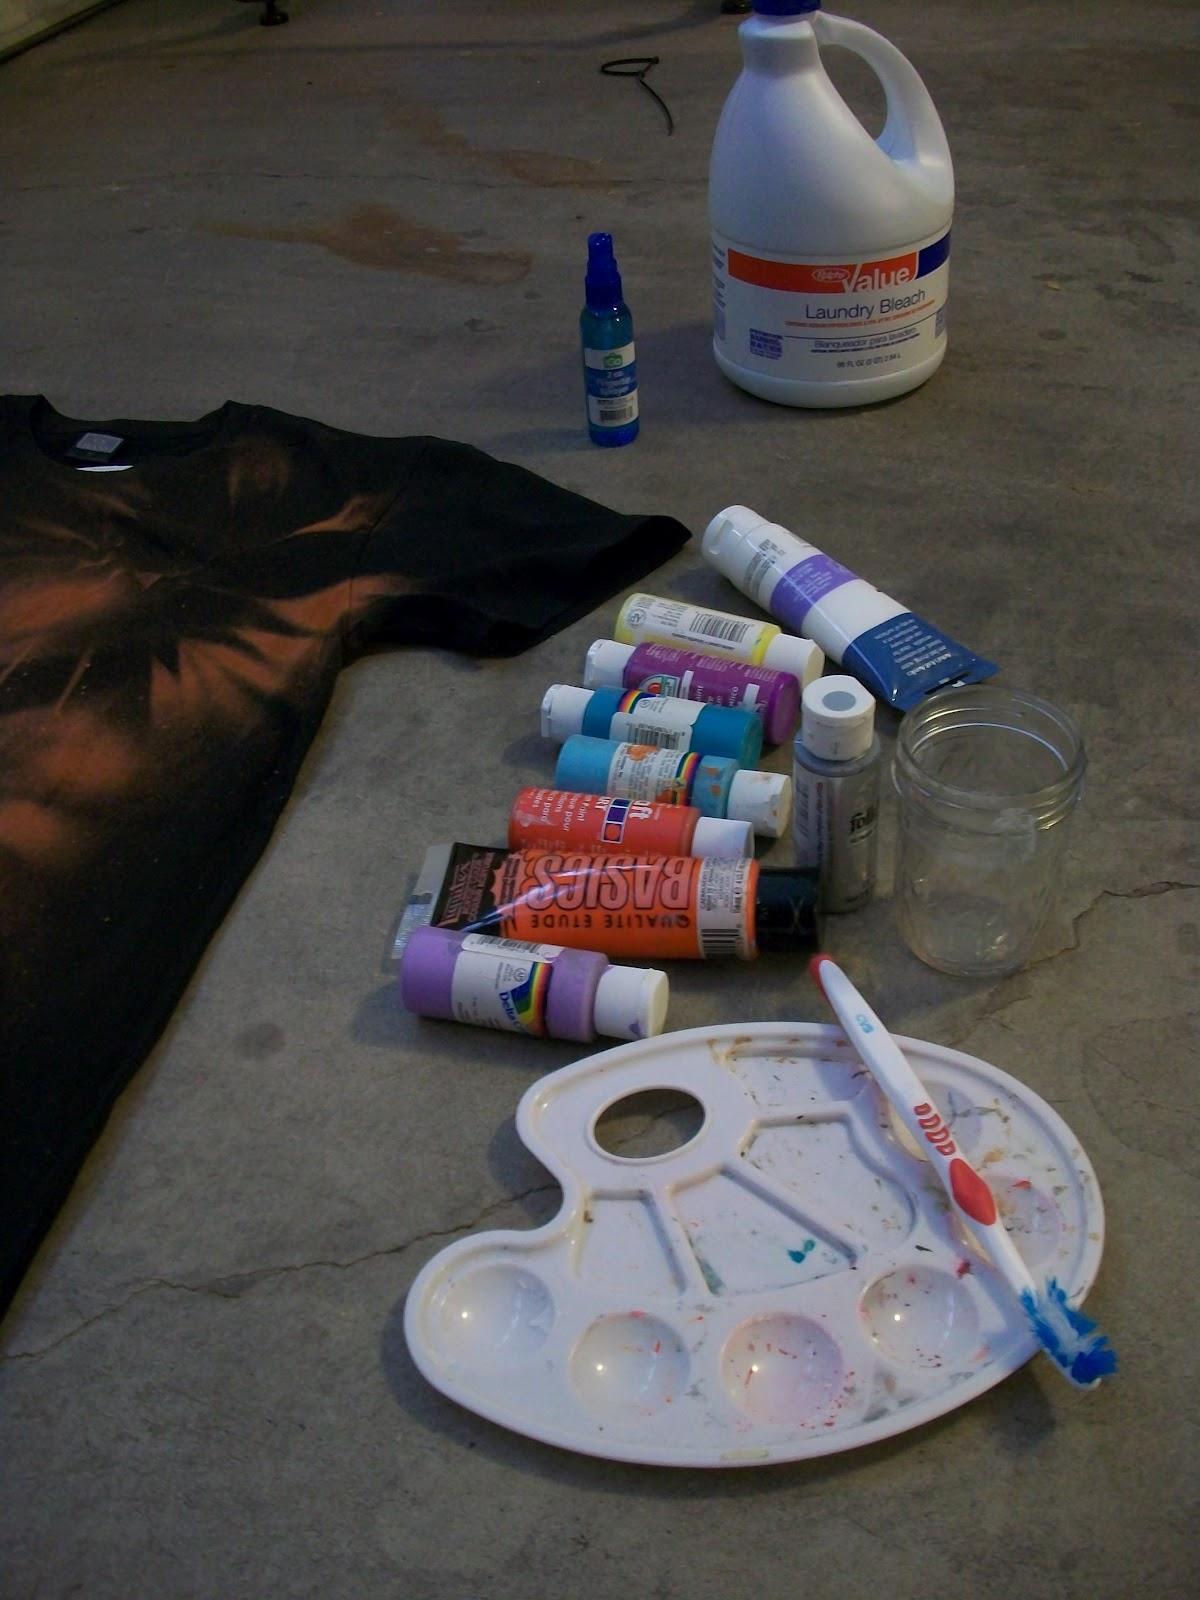 Kaleido Fashion: 8/9/12 DIY Nebula/Galaxy Shirt